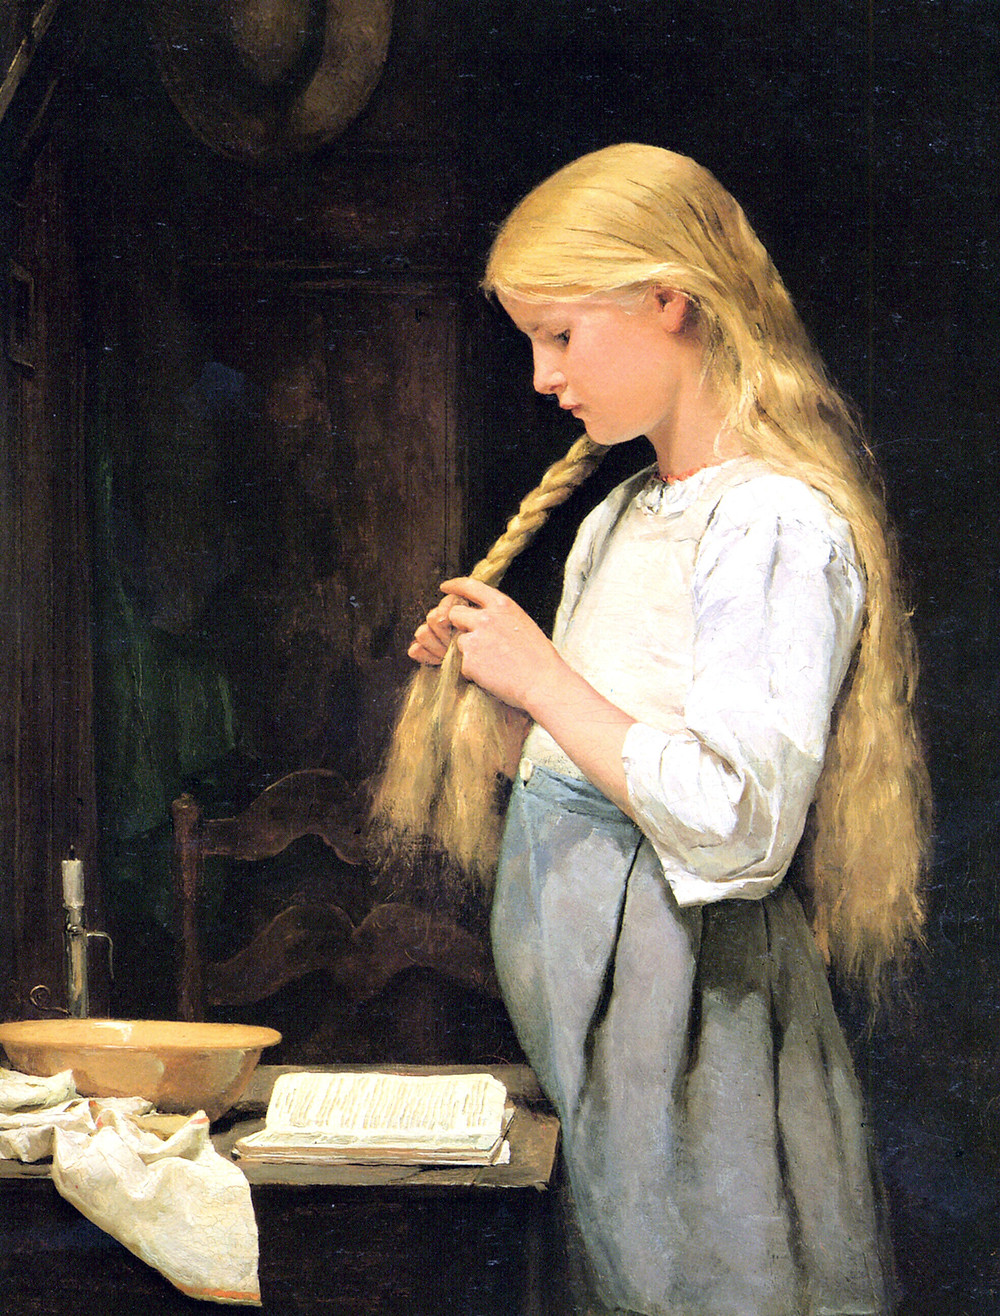 Original Painting by Albert Anker 1887